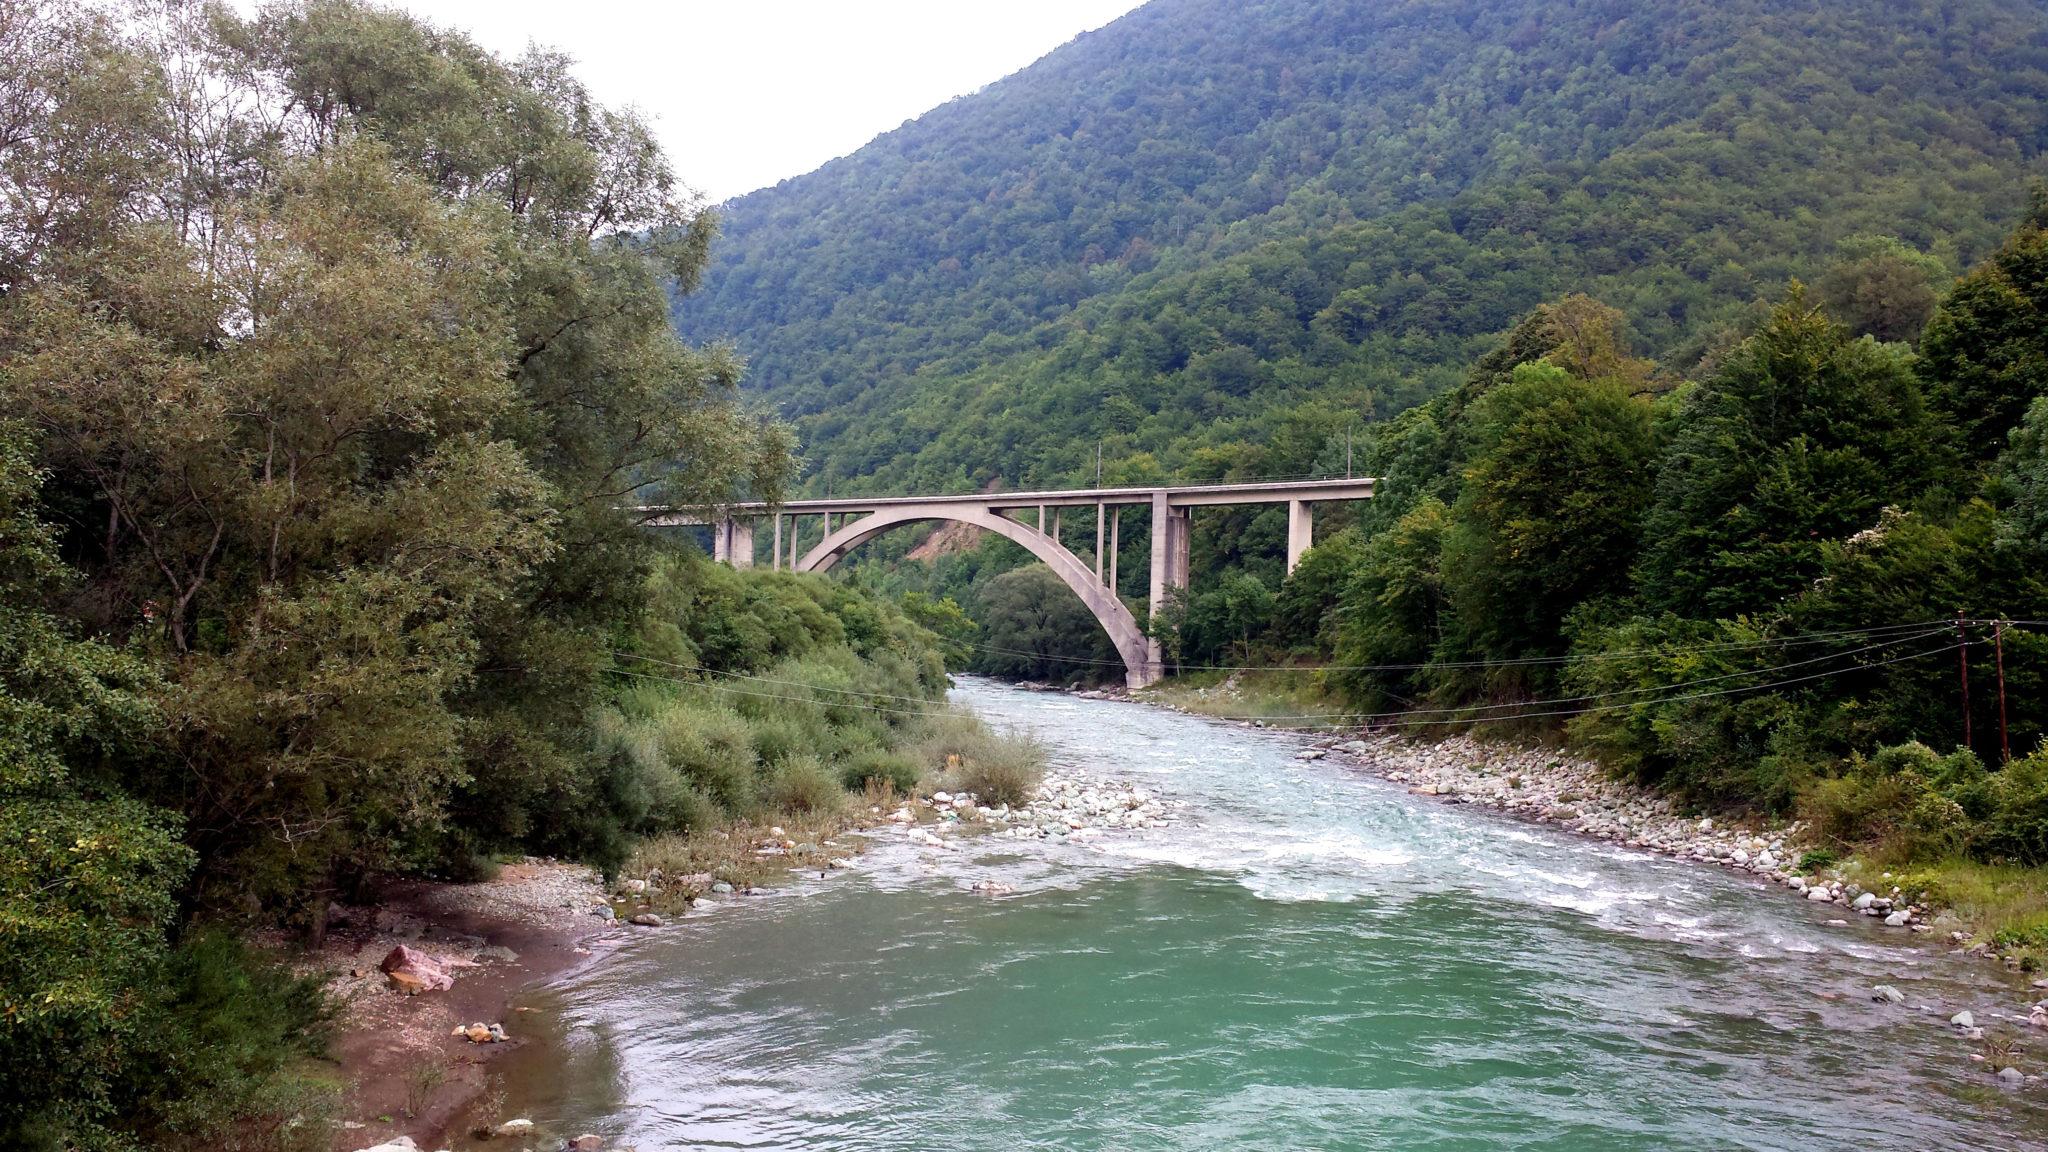 Hemaposesesvalises_montenegro_tyrolienne_zipline_tara_voyage_travel_blog4